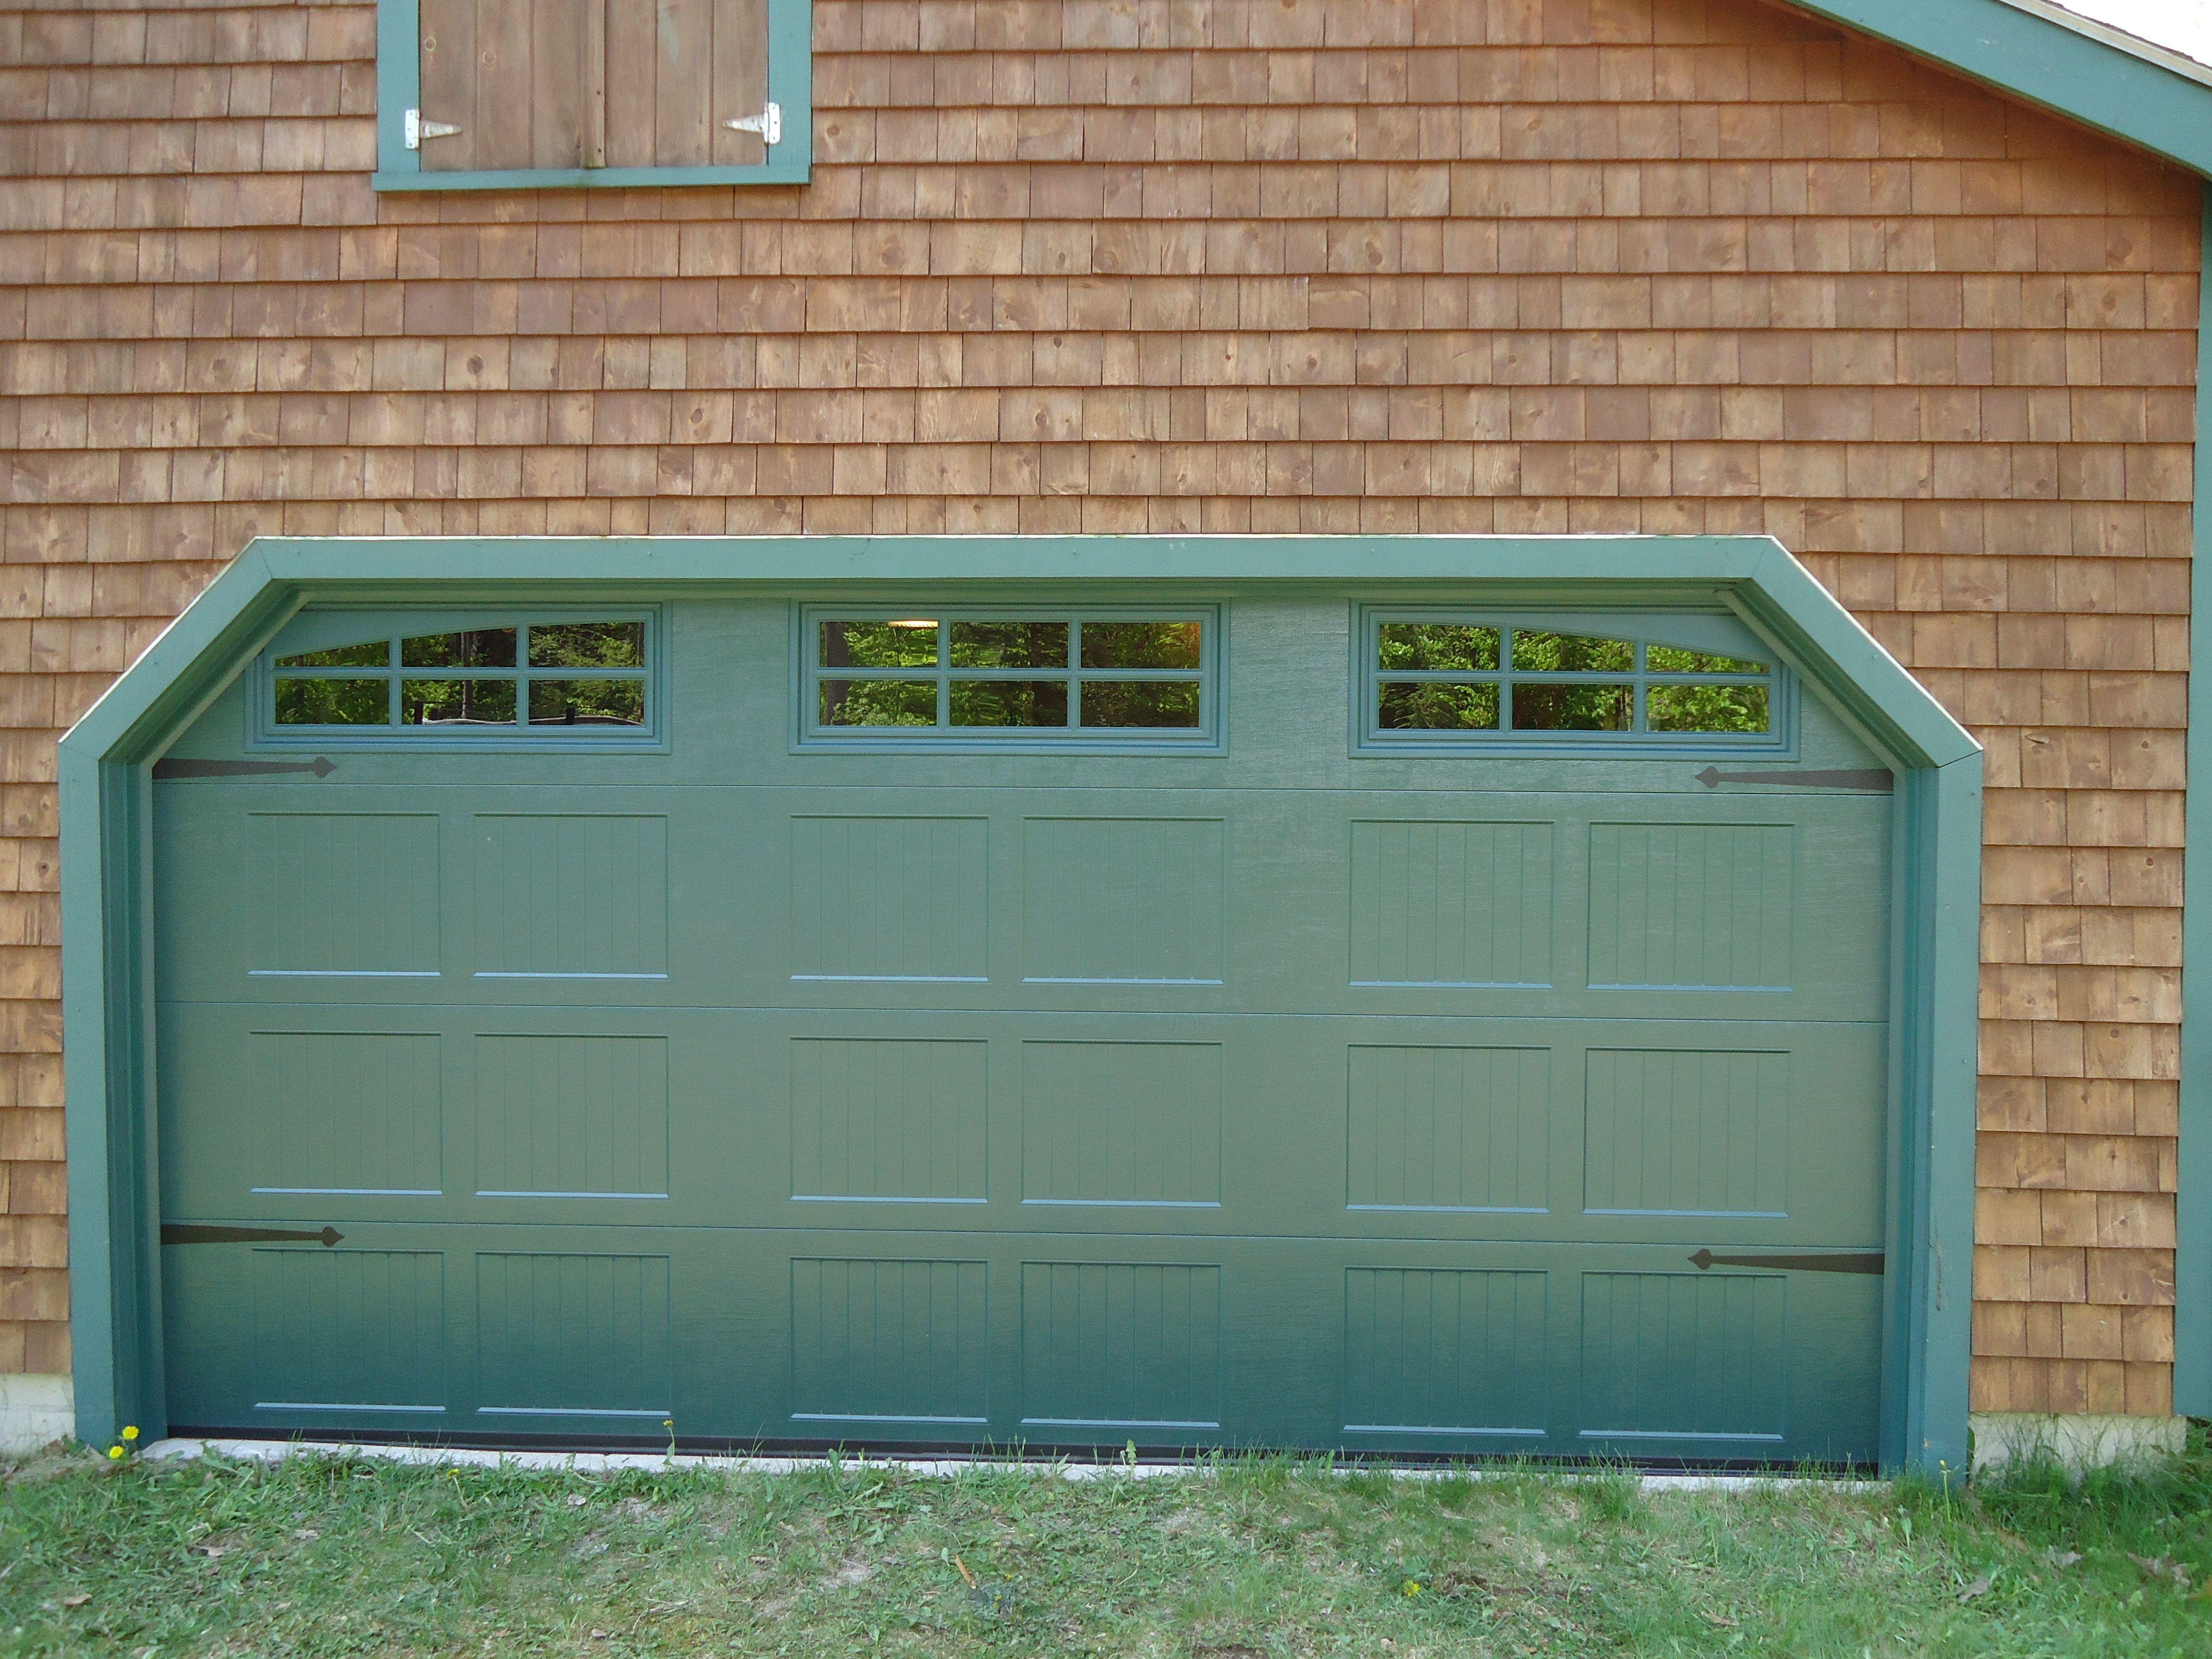 3240 #6F4528 Great In Green! Beautiful Garage Doors Pinterest pic Beautiful Garage Doors 38014320